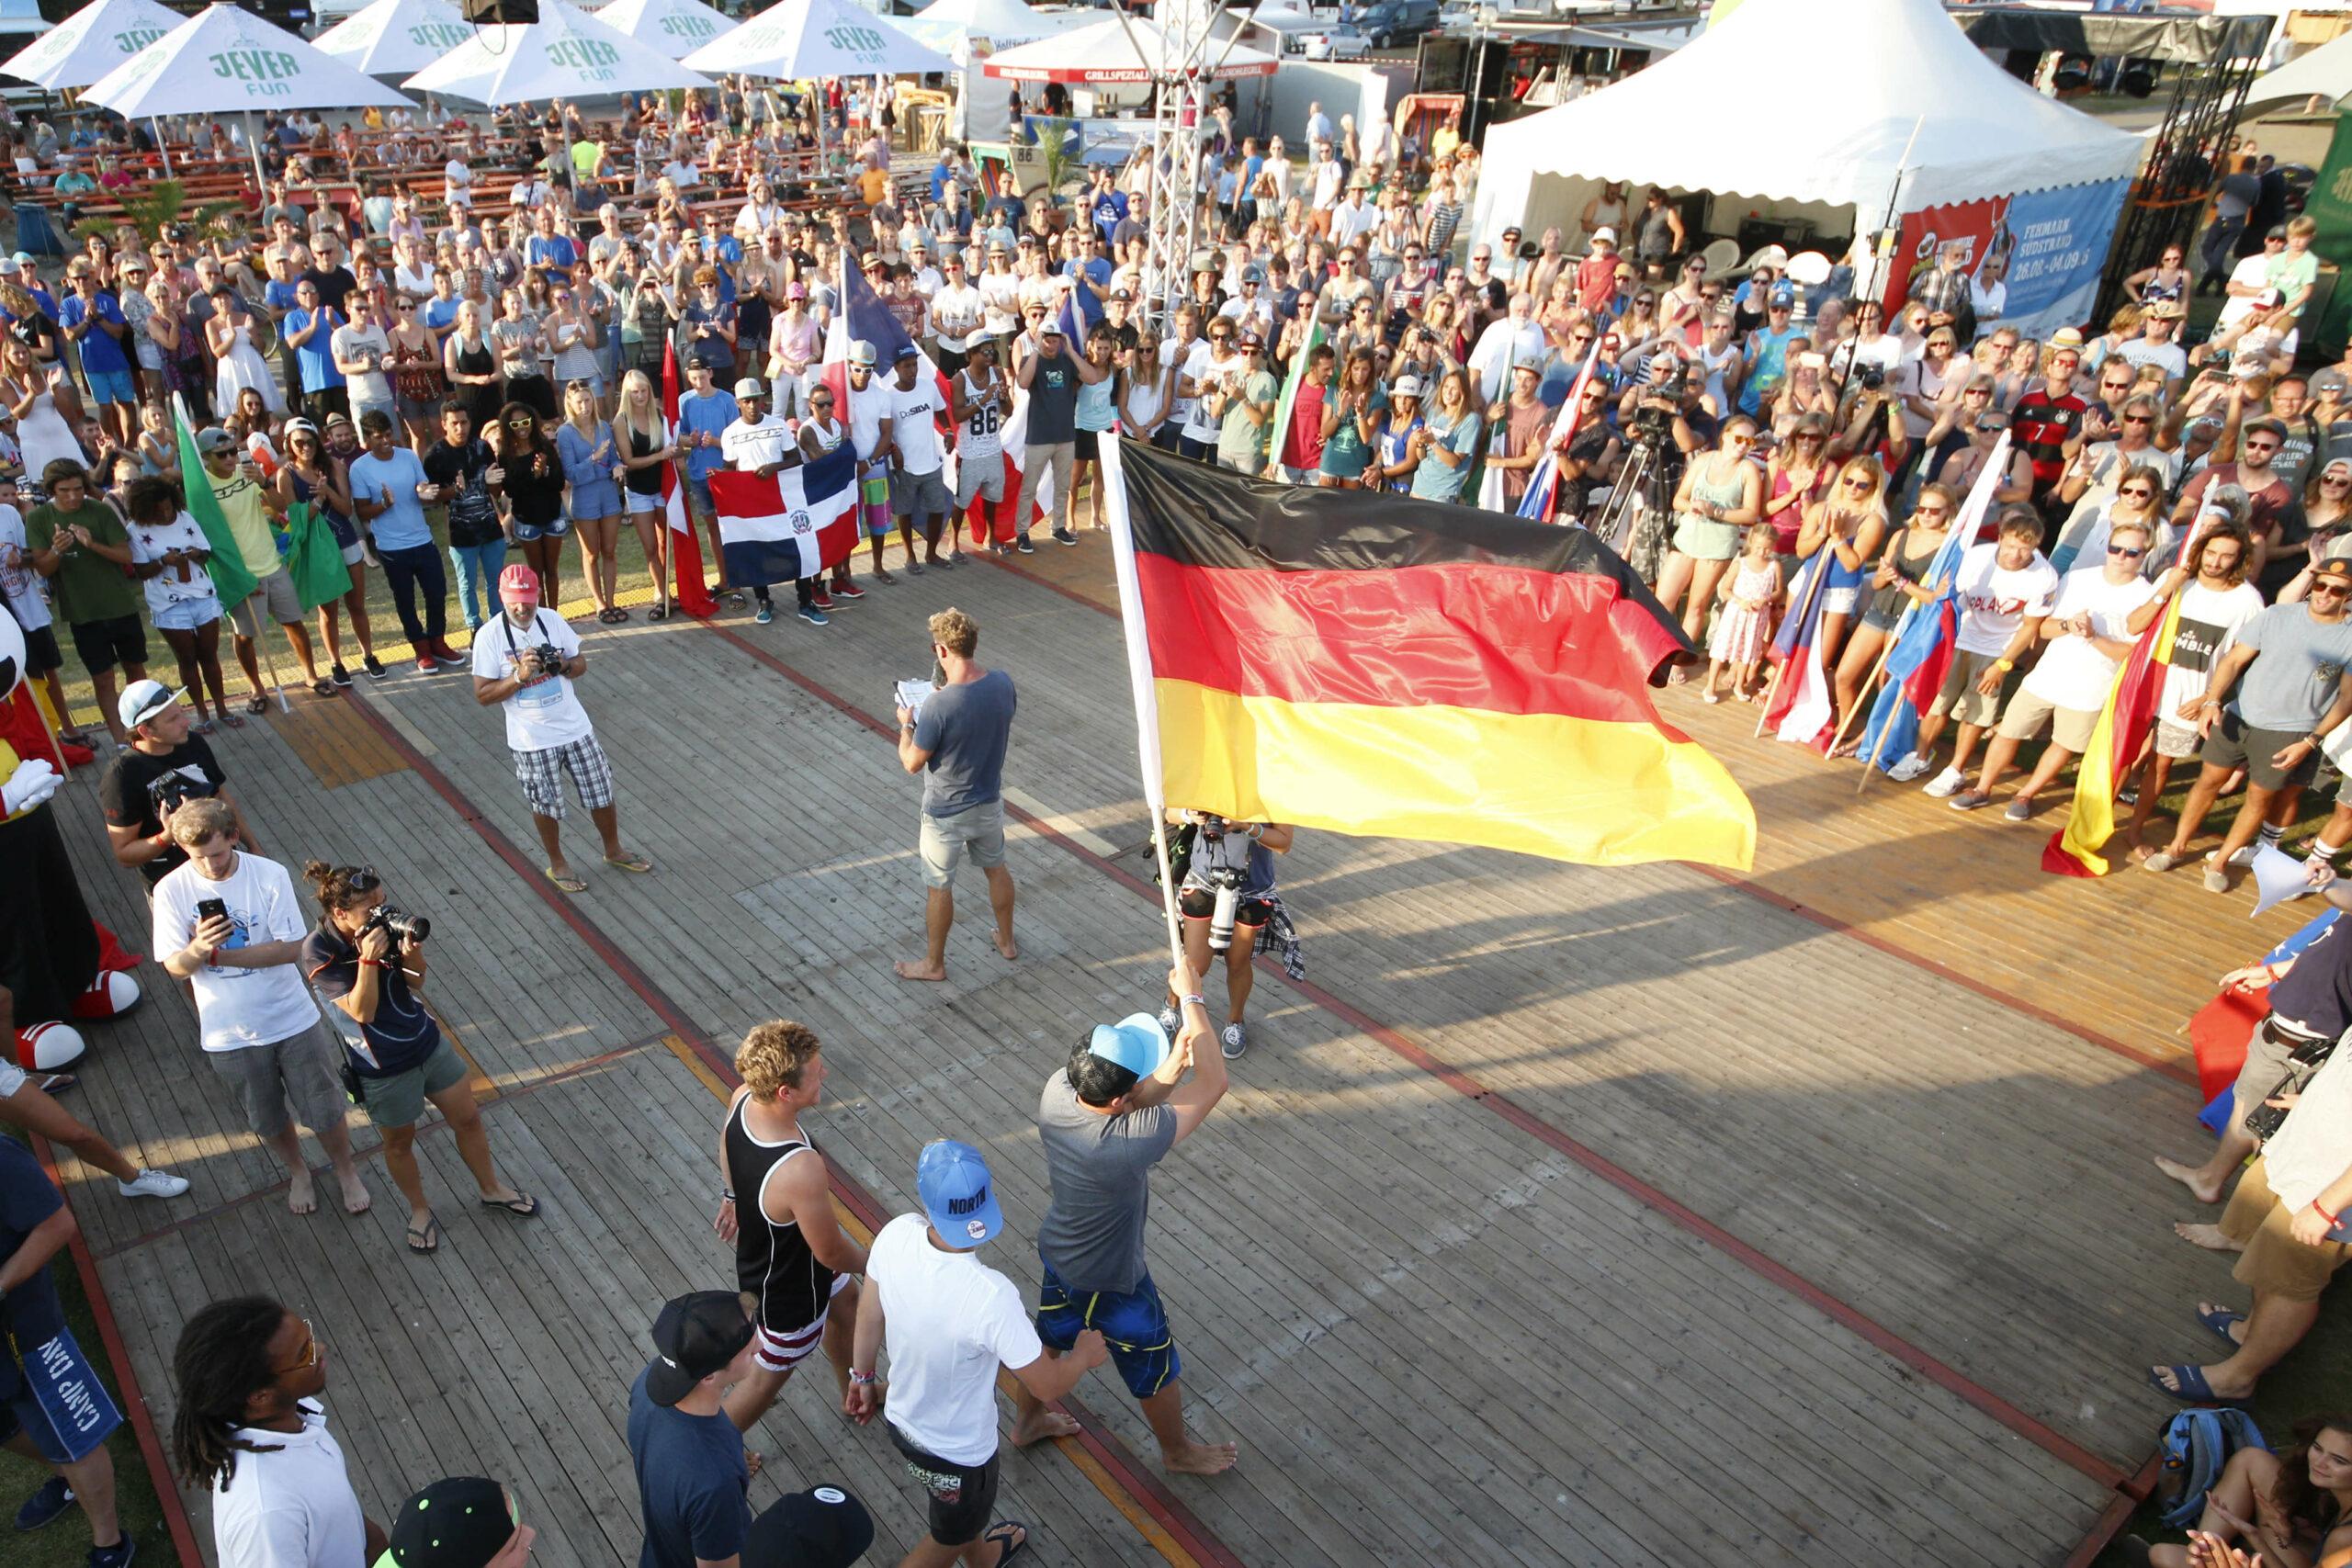 Pringles Kitesurf World Cup 2016, 26.08. - 04.09.2016, Eroeffnung Südstrand, Fehmarn. Photo: Joern Pollex/HochZwei